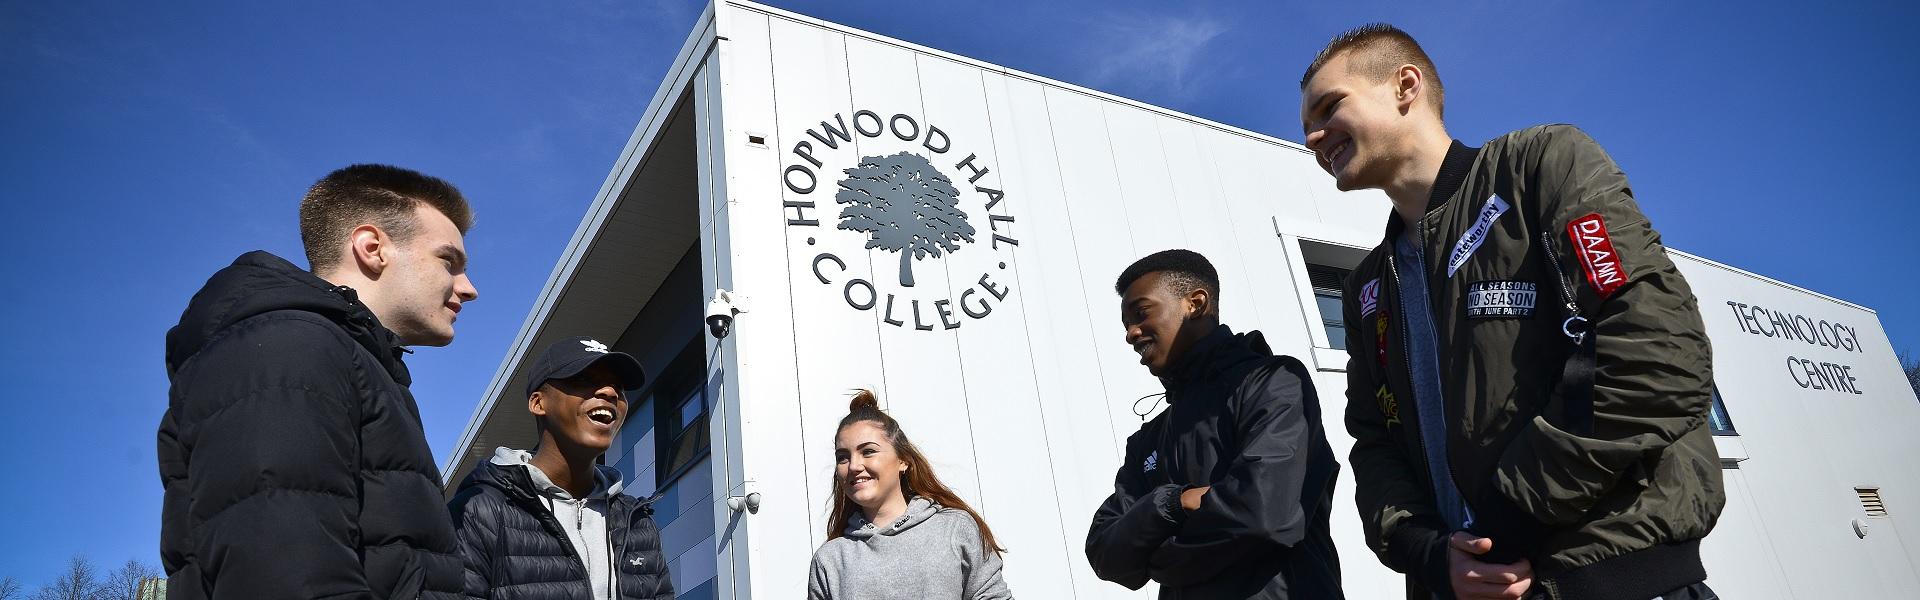 Hopwood Hall College Apprenticeships